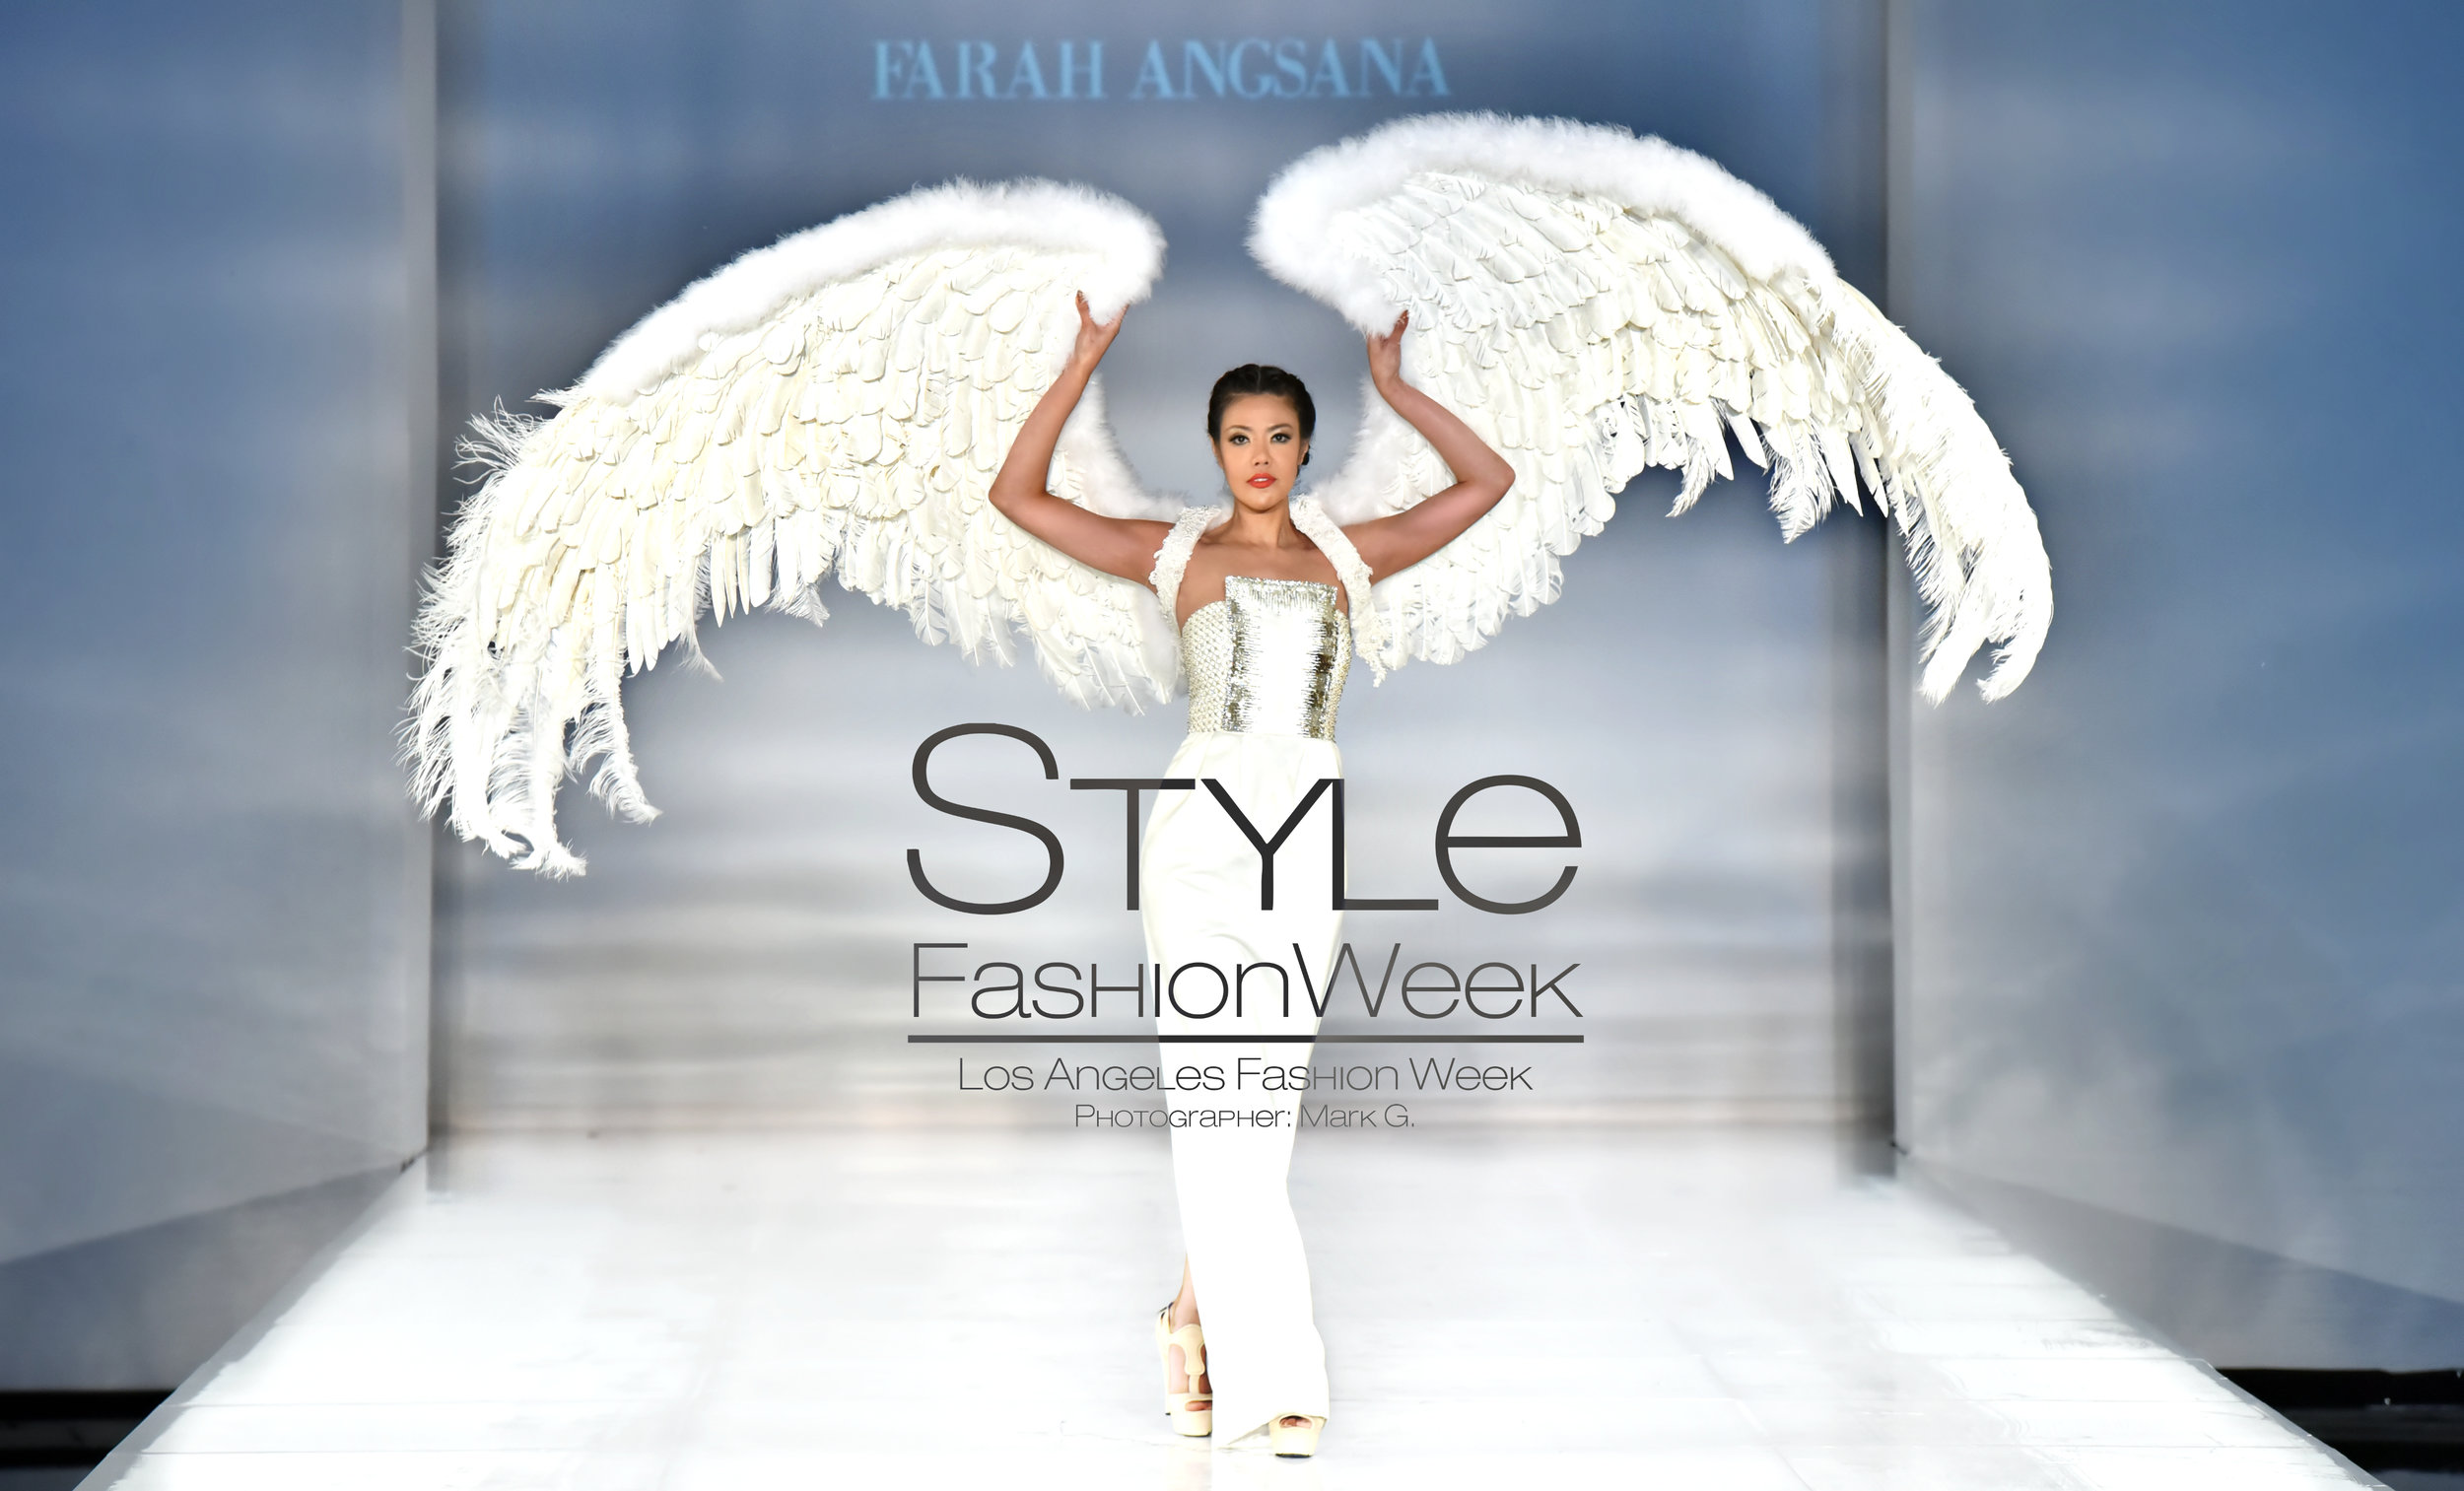 Style Fashion Week 2016 FW Designer Farah